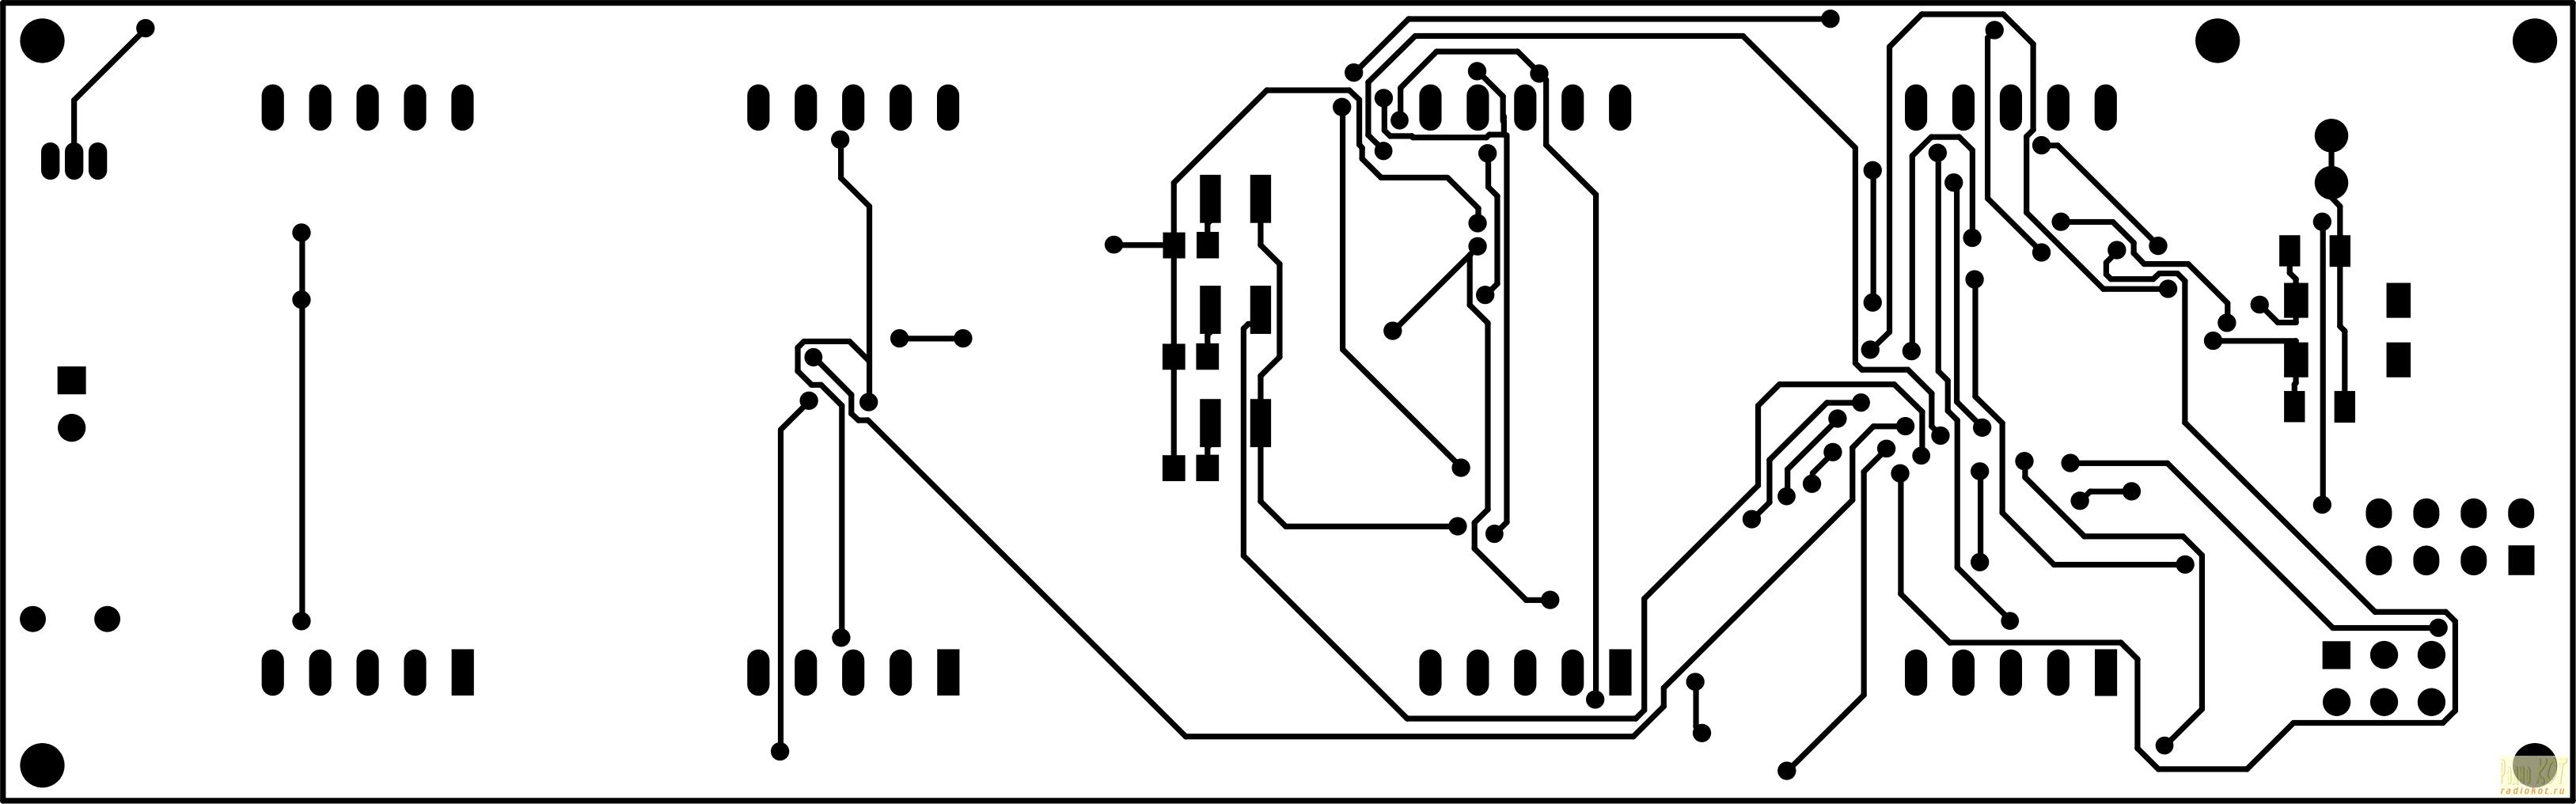 к1156ен1п схема